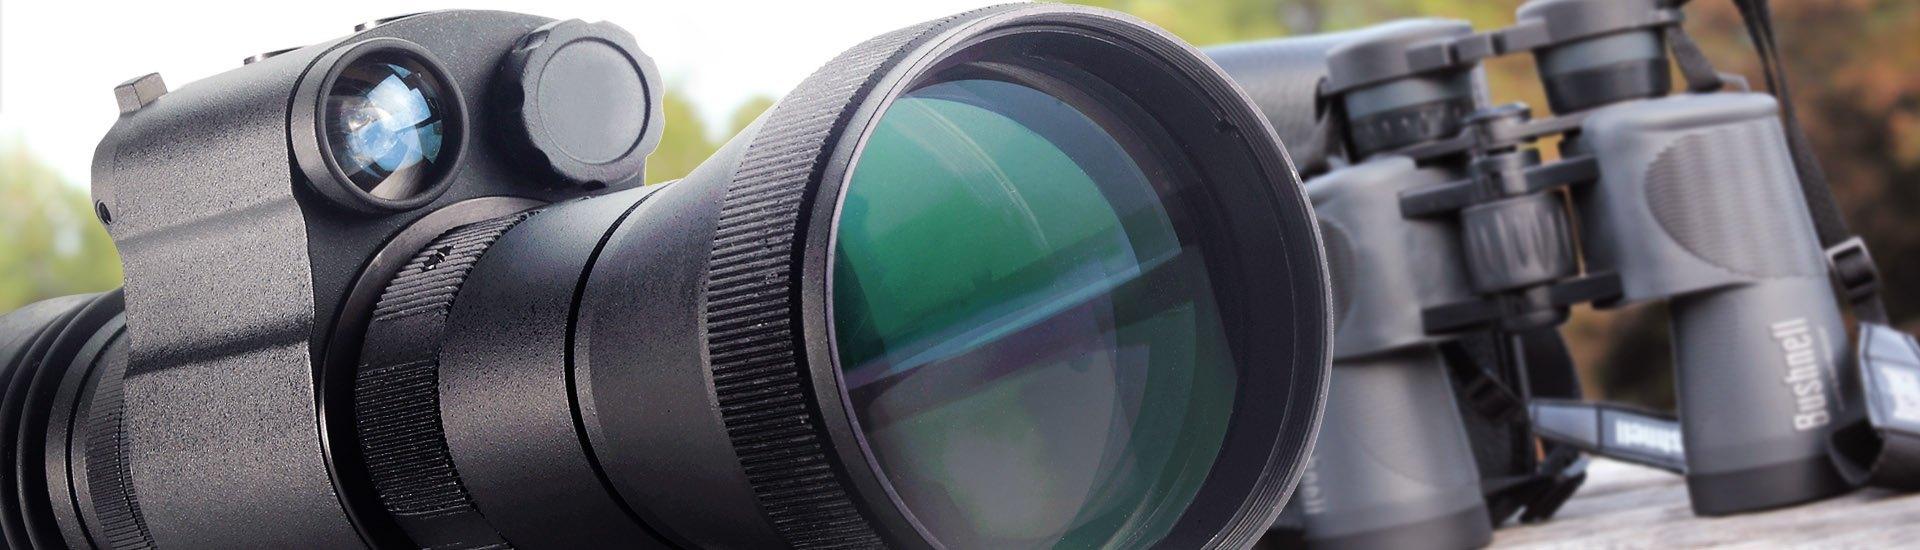 Optical Equipment   Binoculars, Telescopes, Rifle Scopes